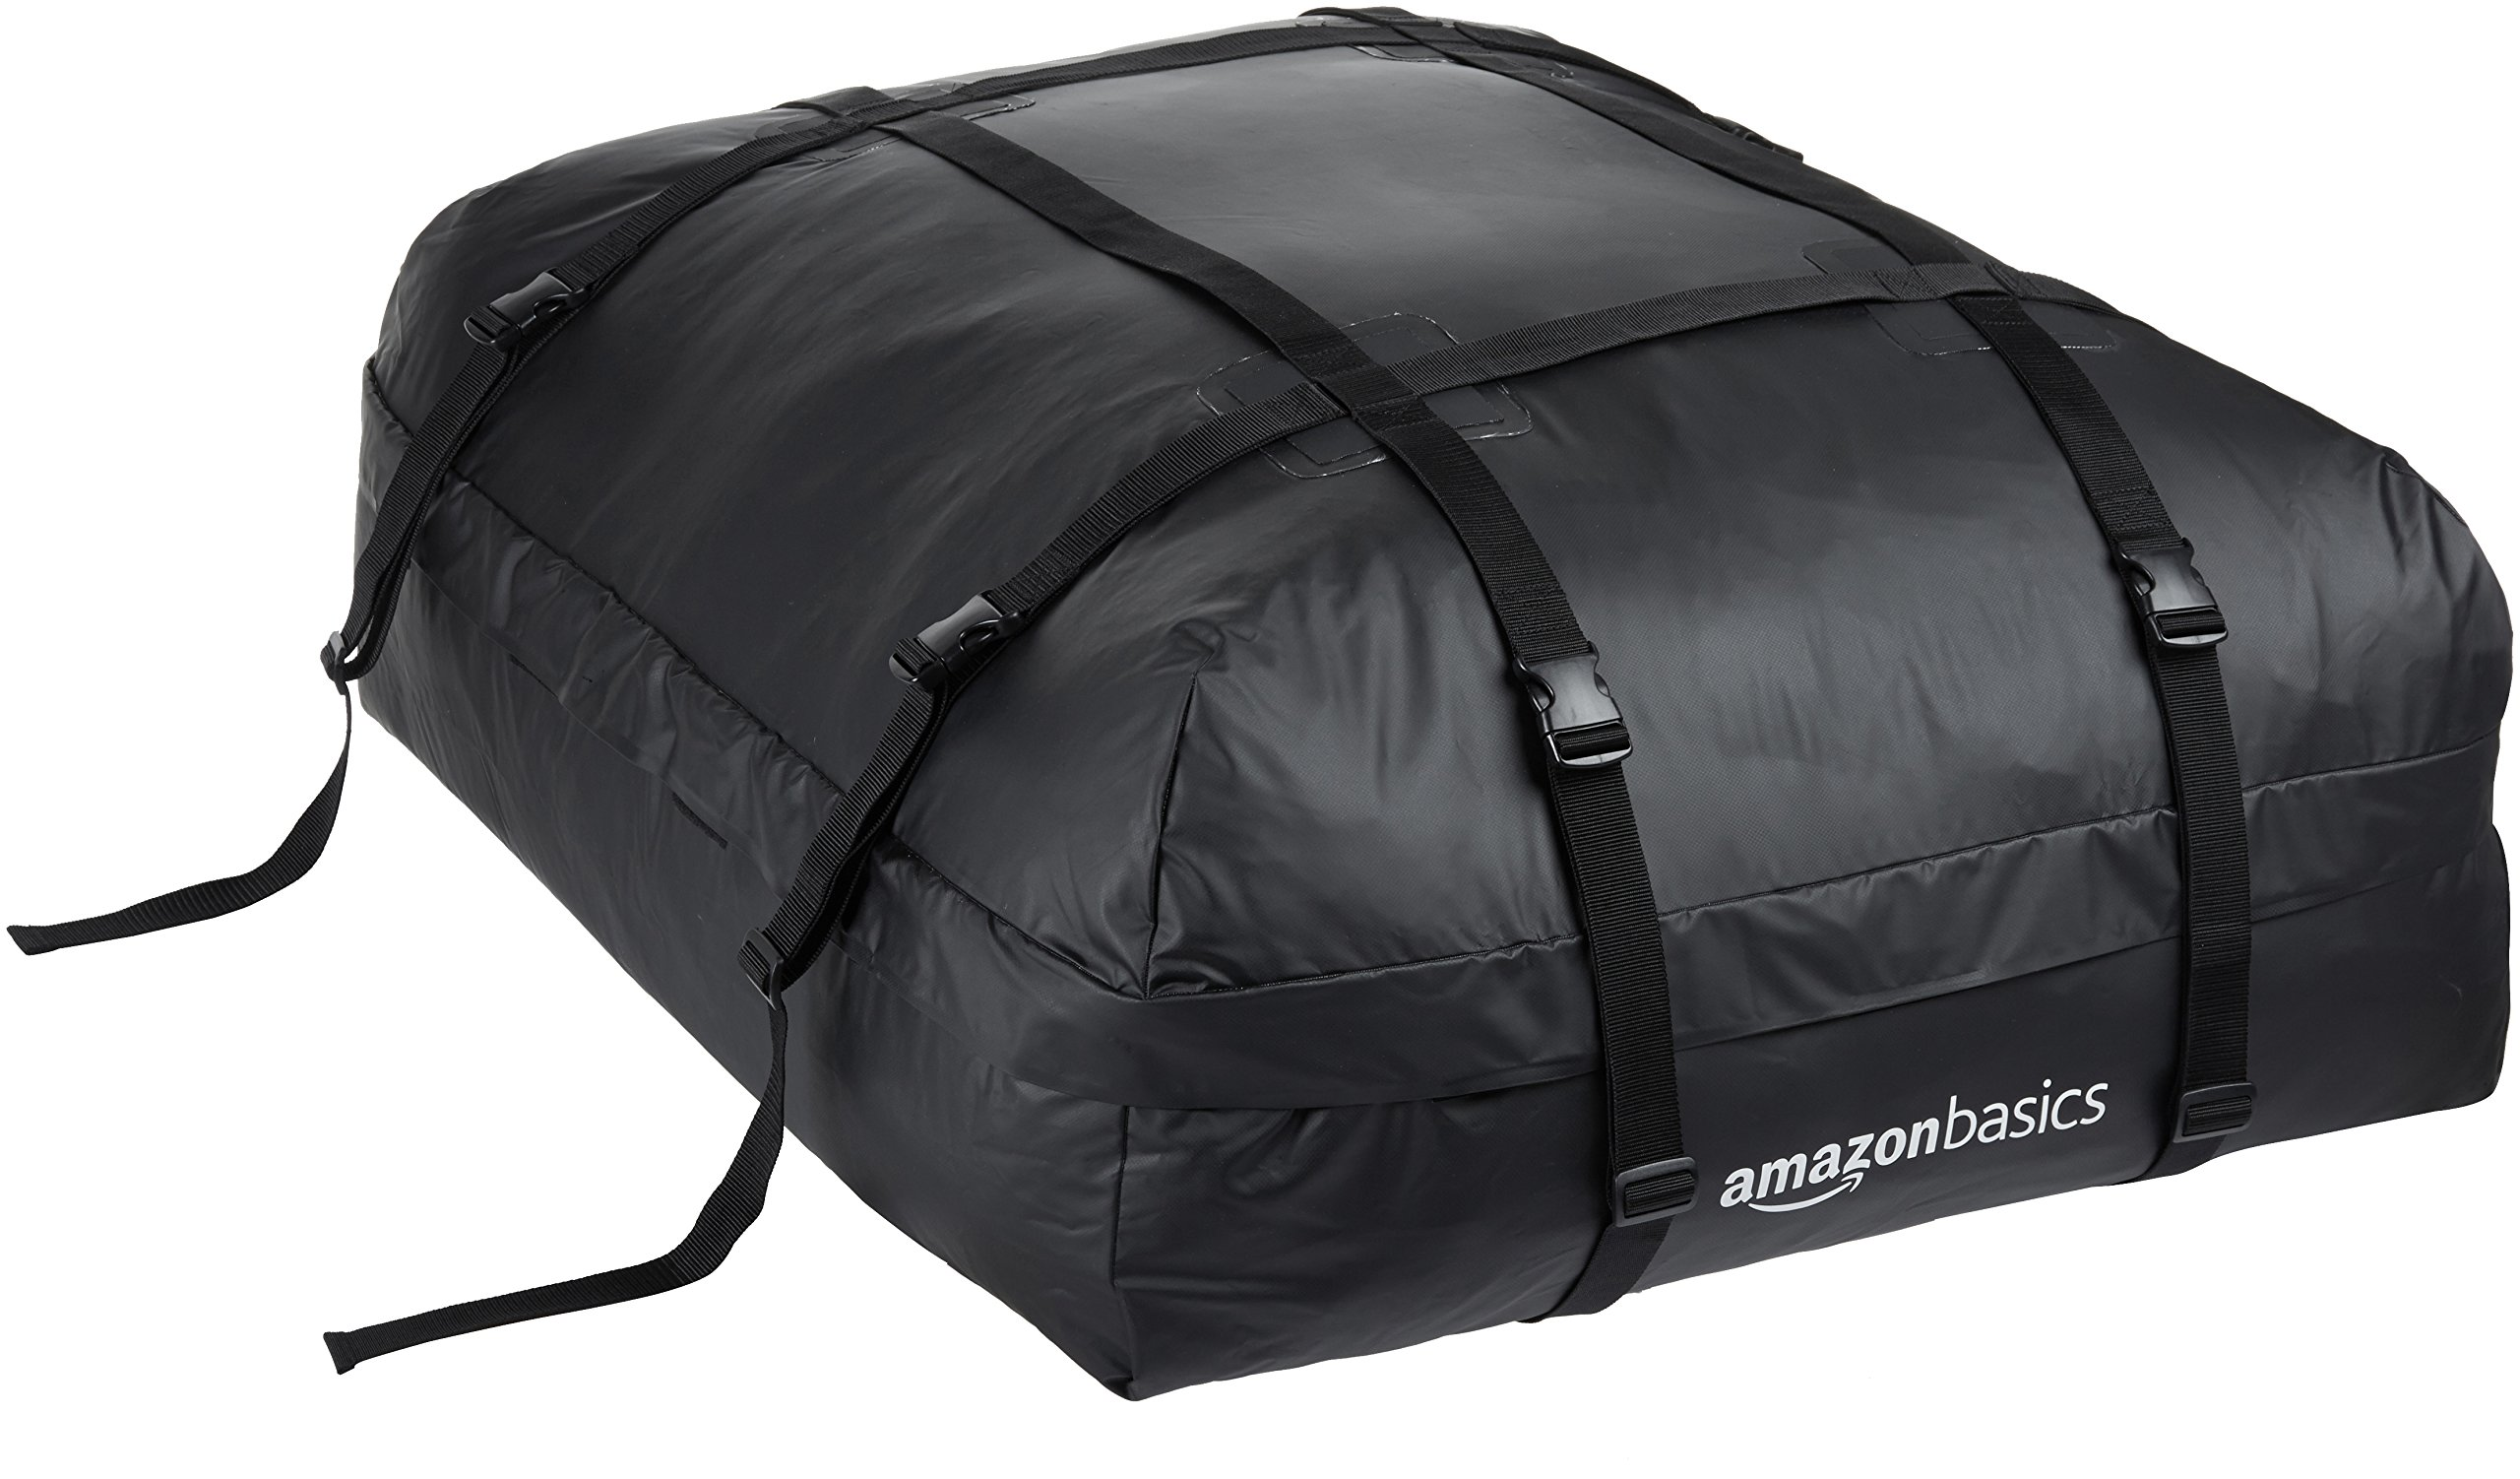 AmazonBasics -Portaeqiupajes baca, Negro, 425 L product image